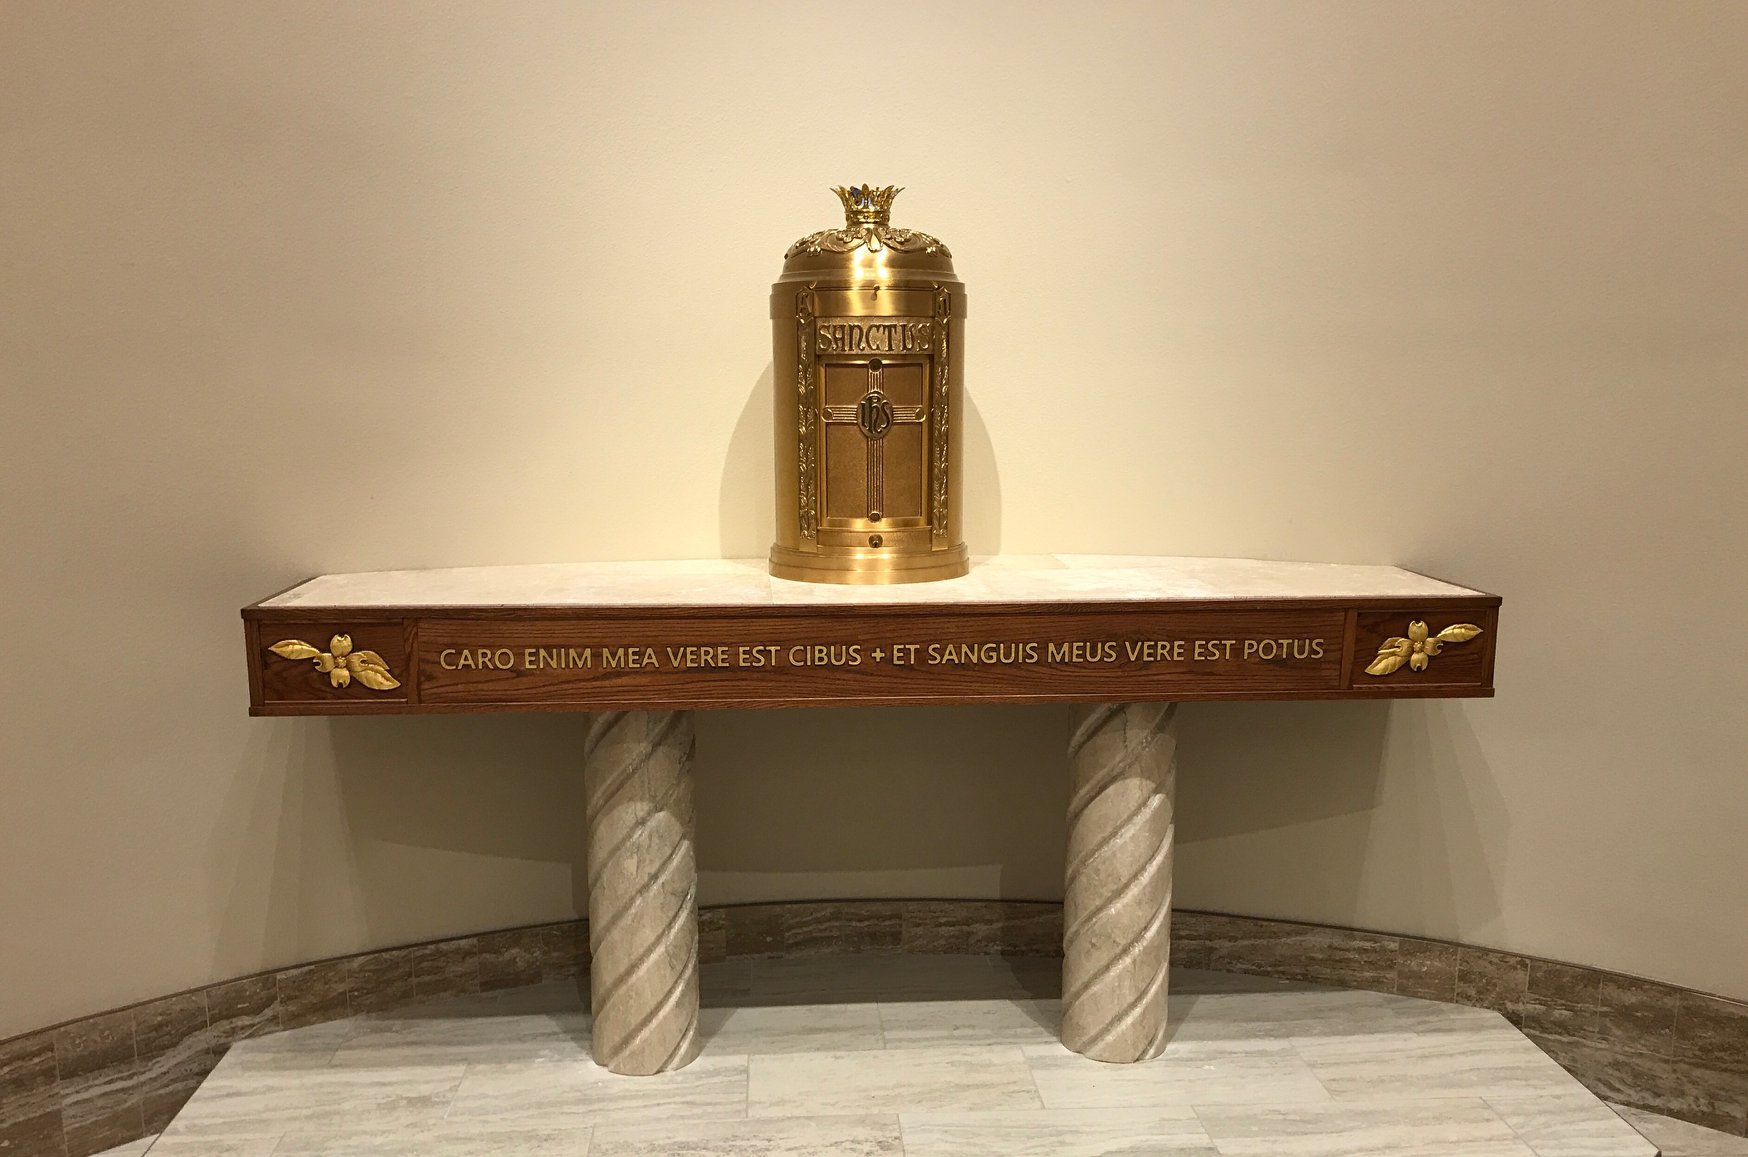 Tabernacle throne